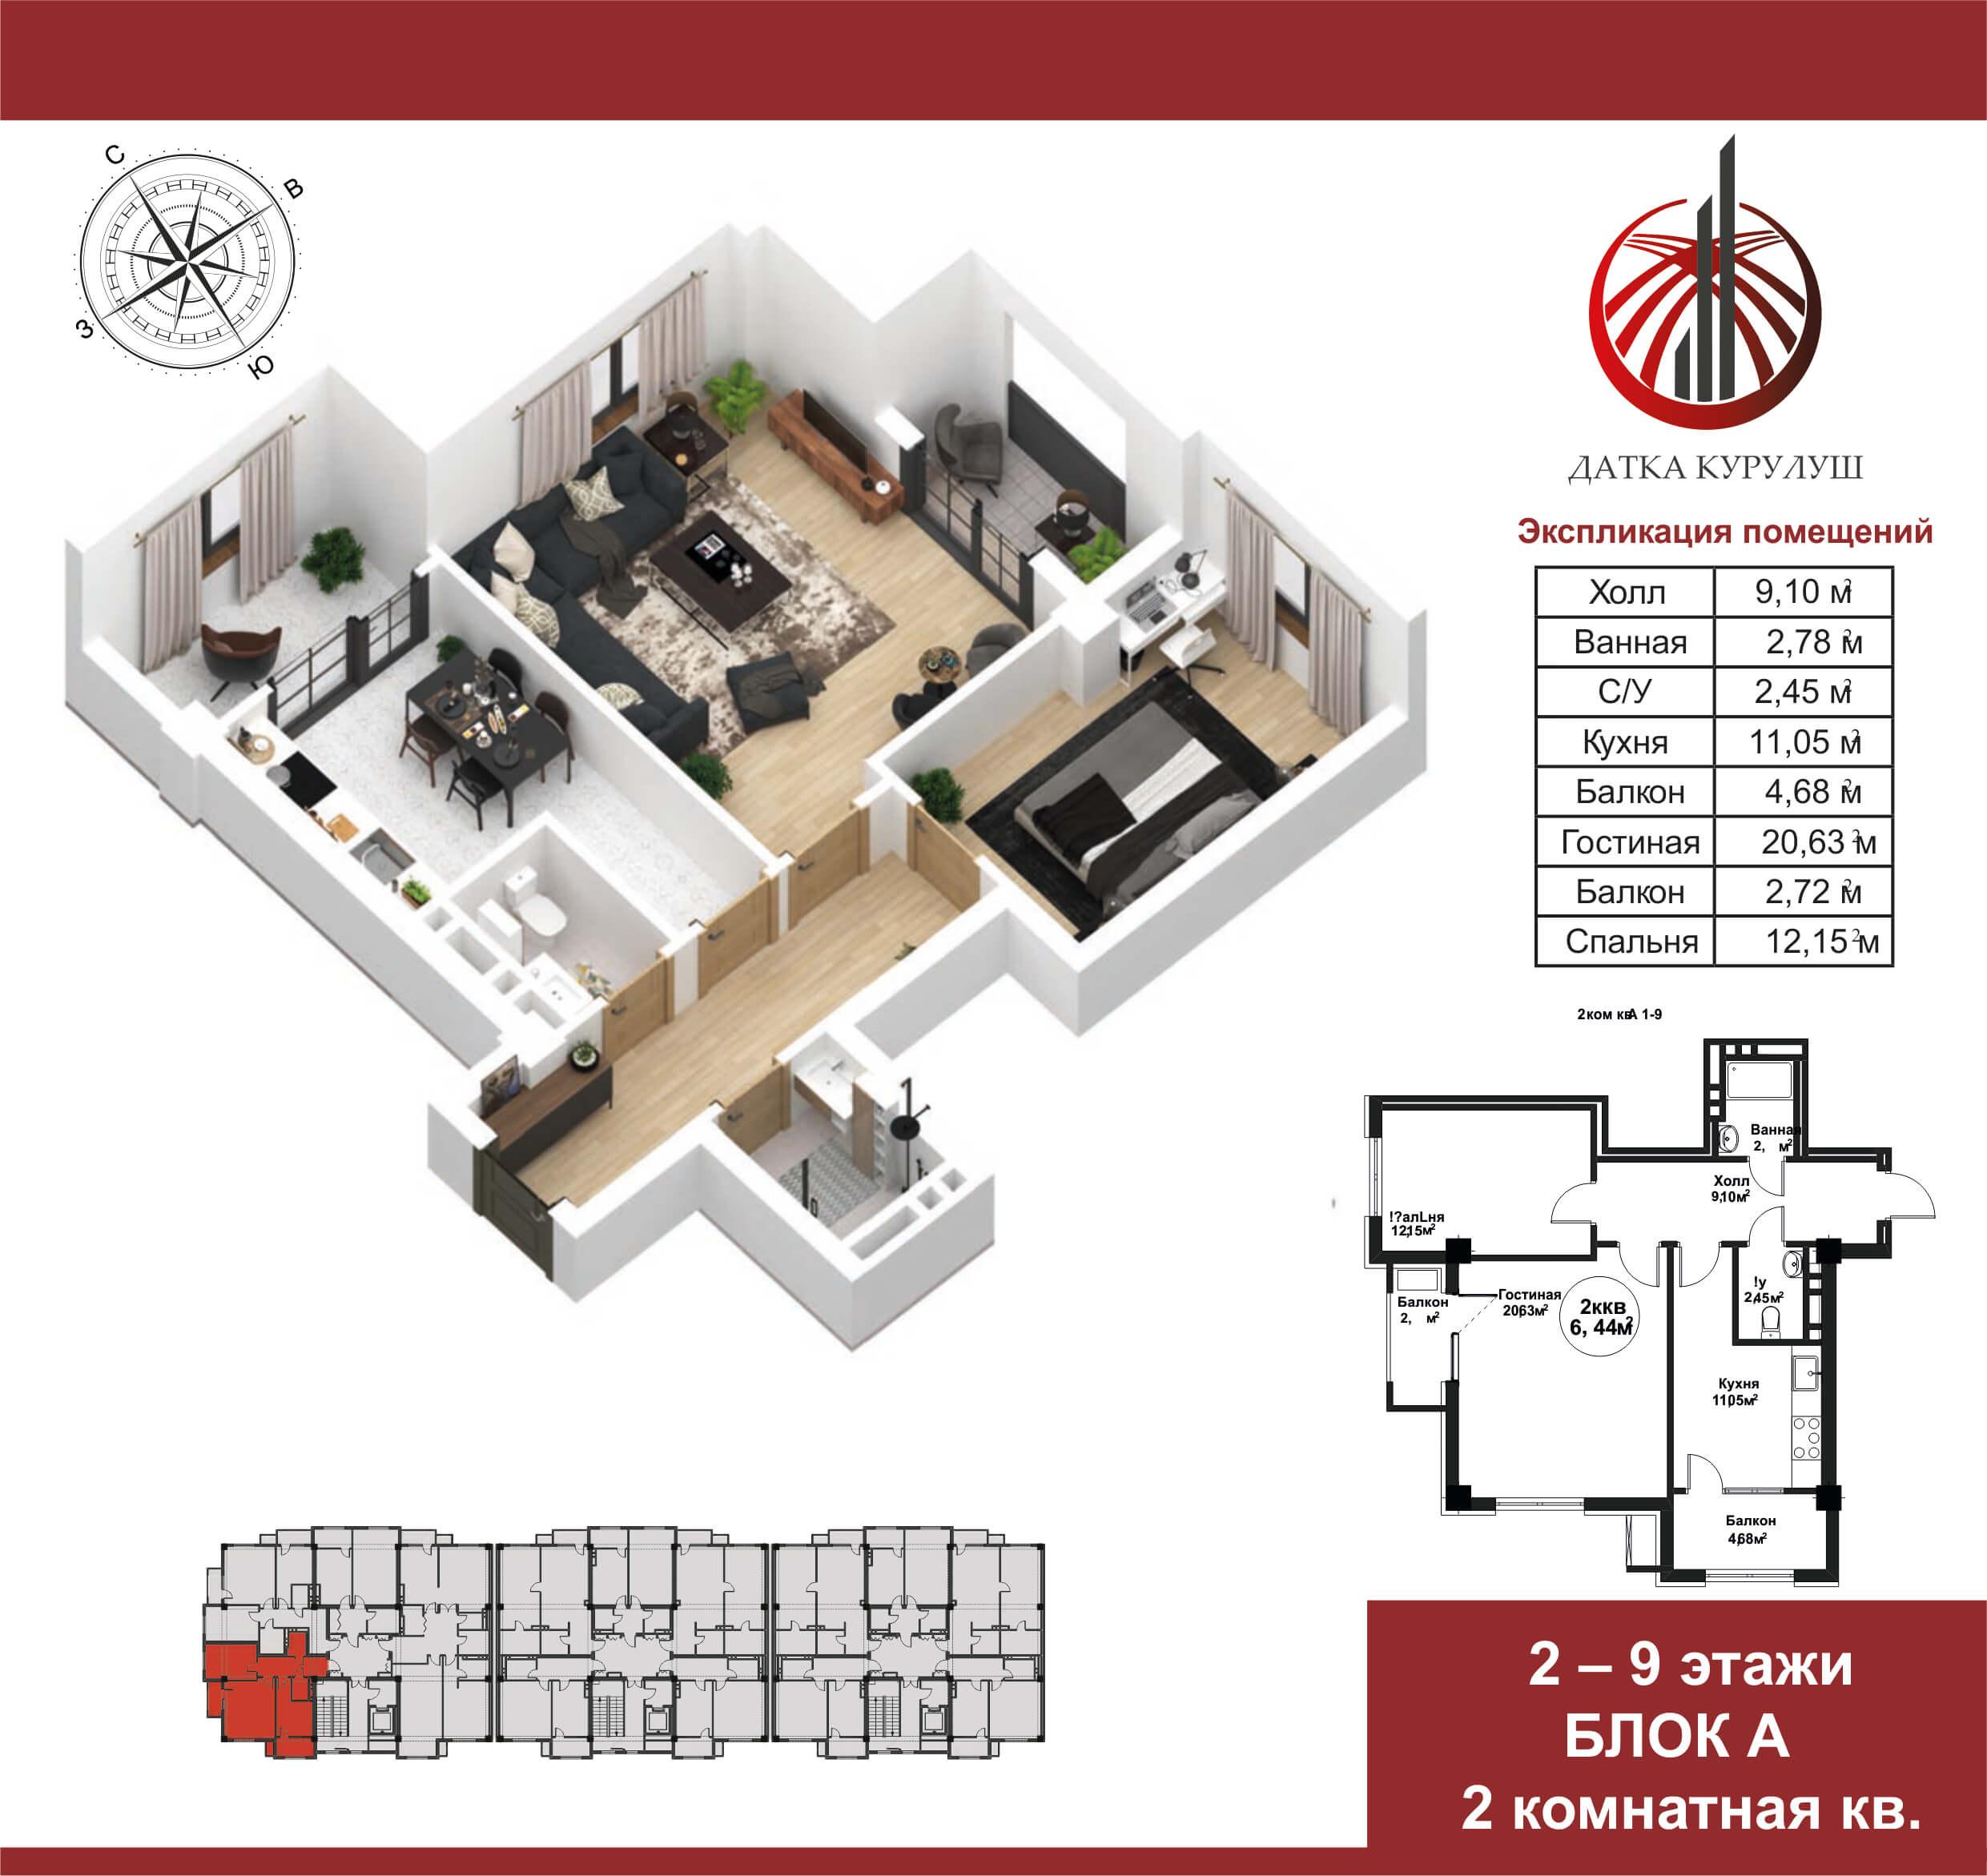 2 х комнатная квартира 67,44 кв.м.